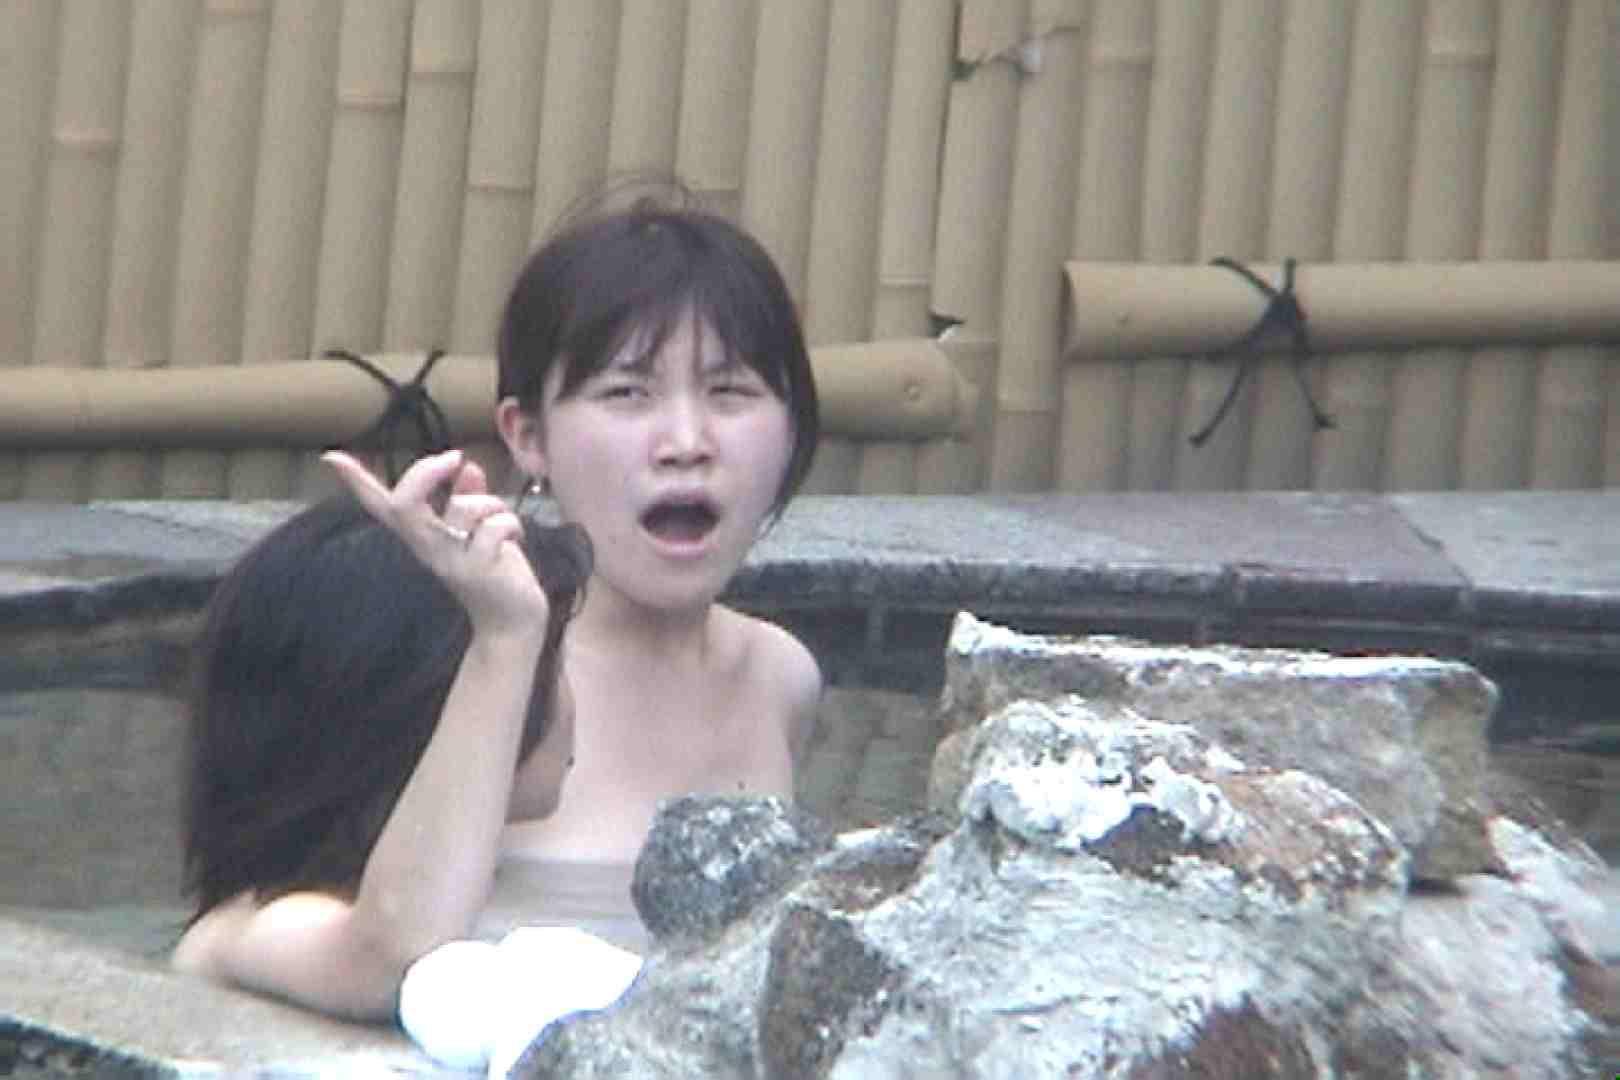 Aquaな露天風呂Vol.79【VIP限定】 盗撮 | HなOL  100pic 19